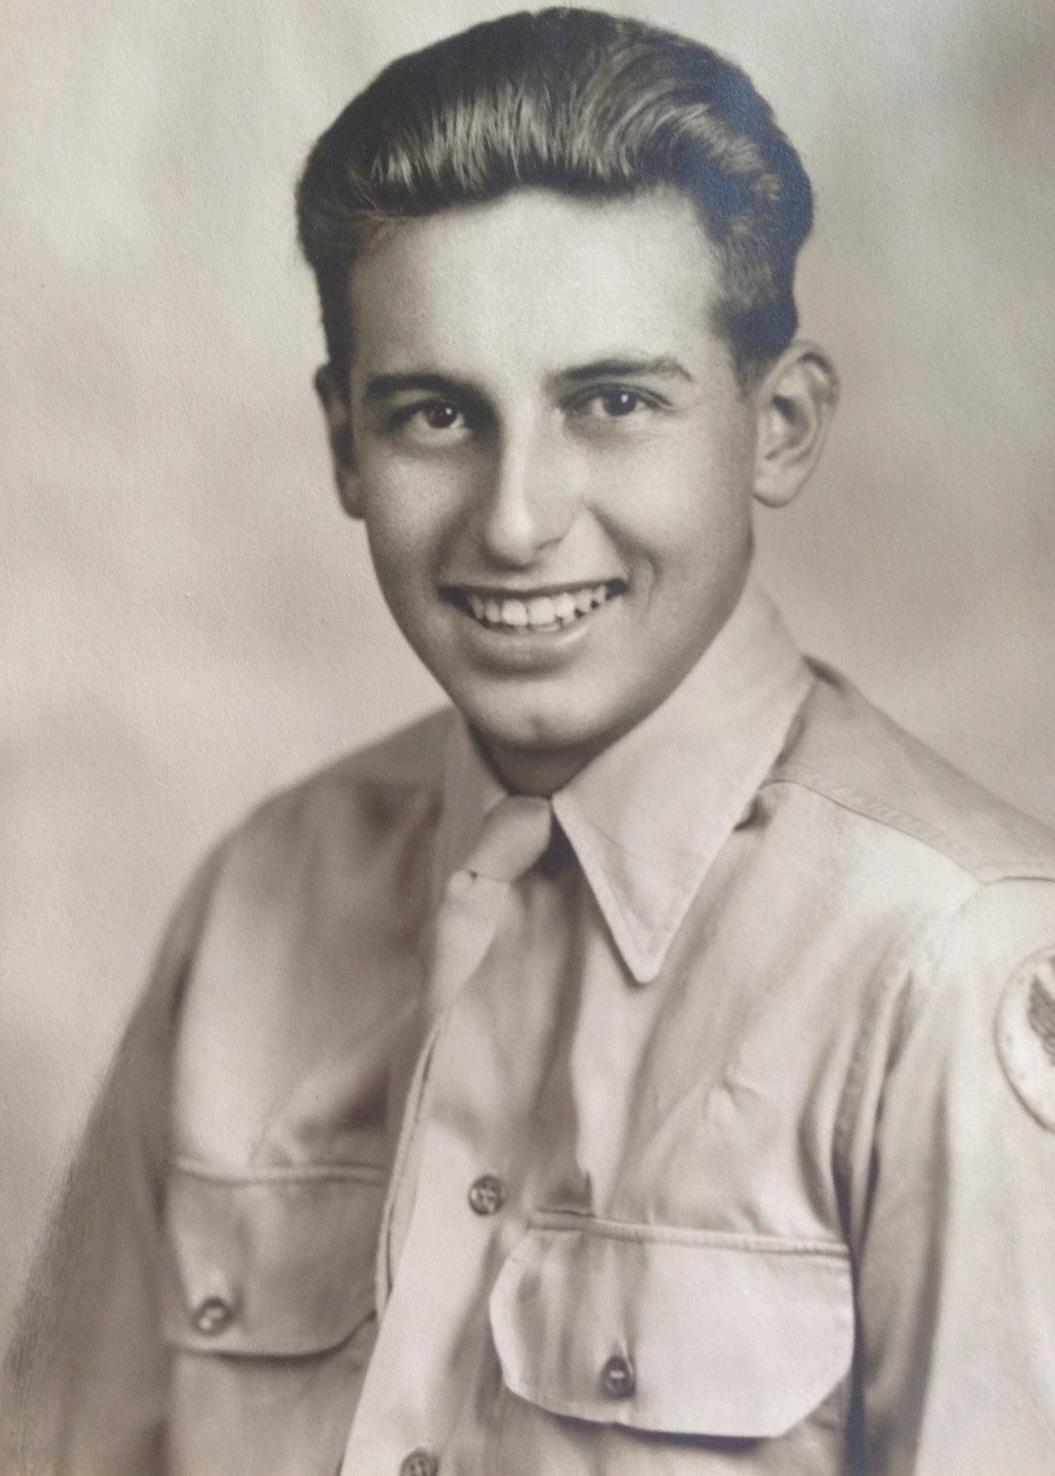 U.S. Army Air Corps veteran